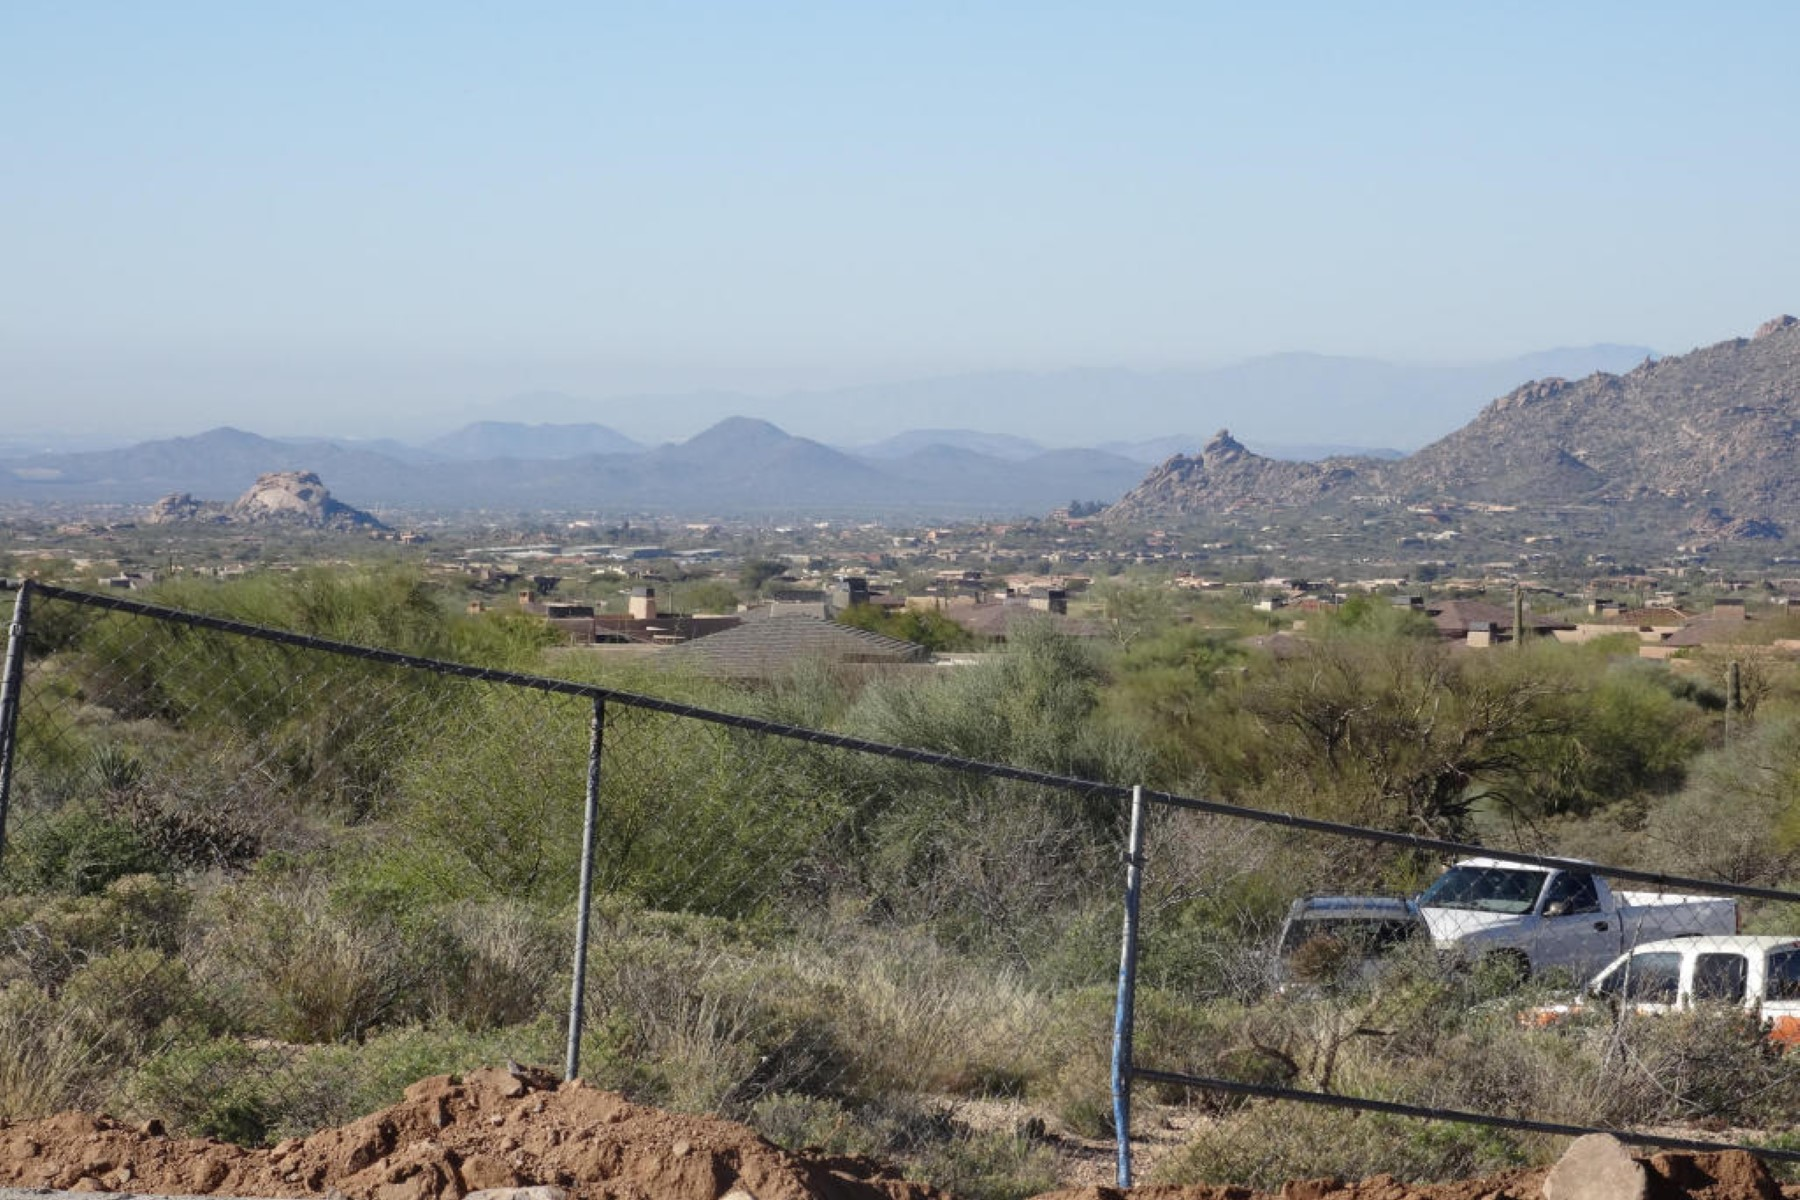 Moradia para Venda às Innovative Design in Desert Mountain 39275 N 104th Way Scottsdale, Arizona 85262 Estados Unidos